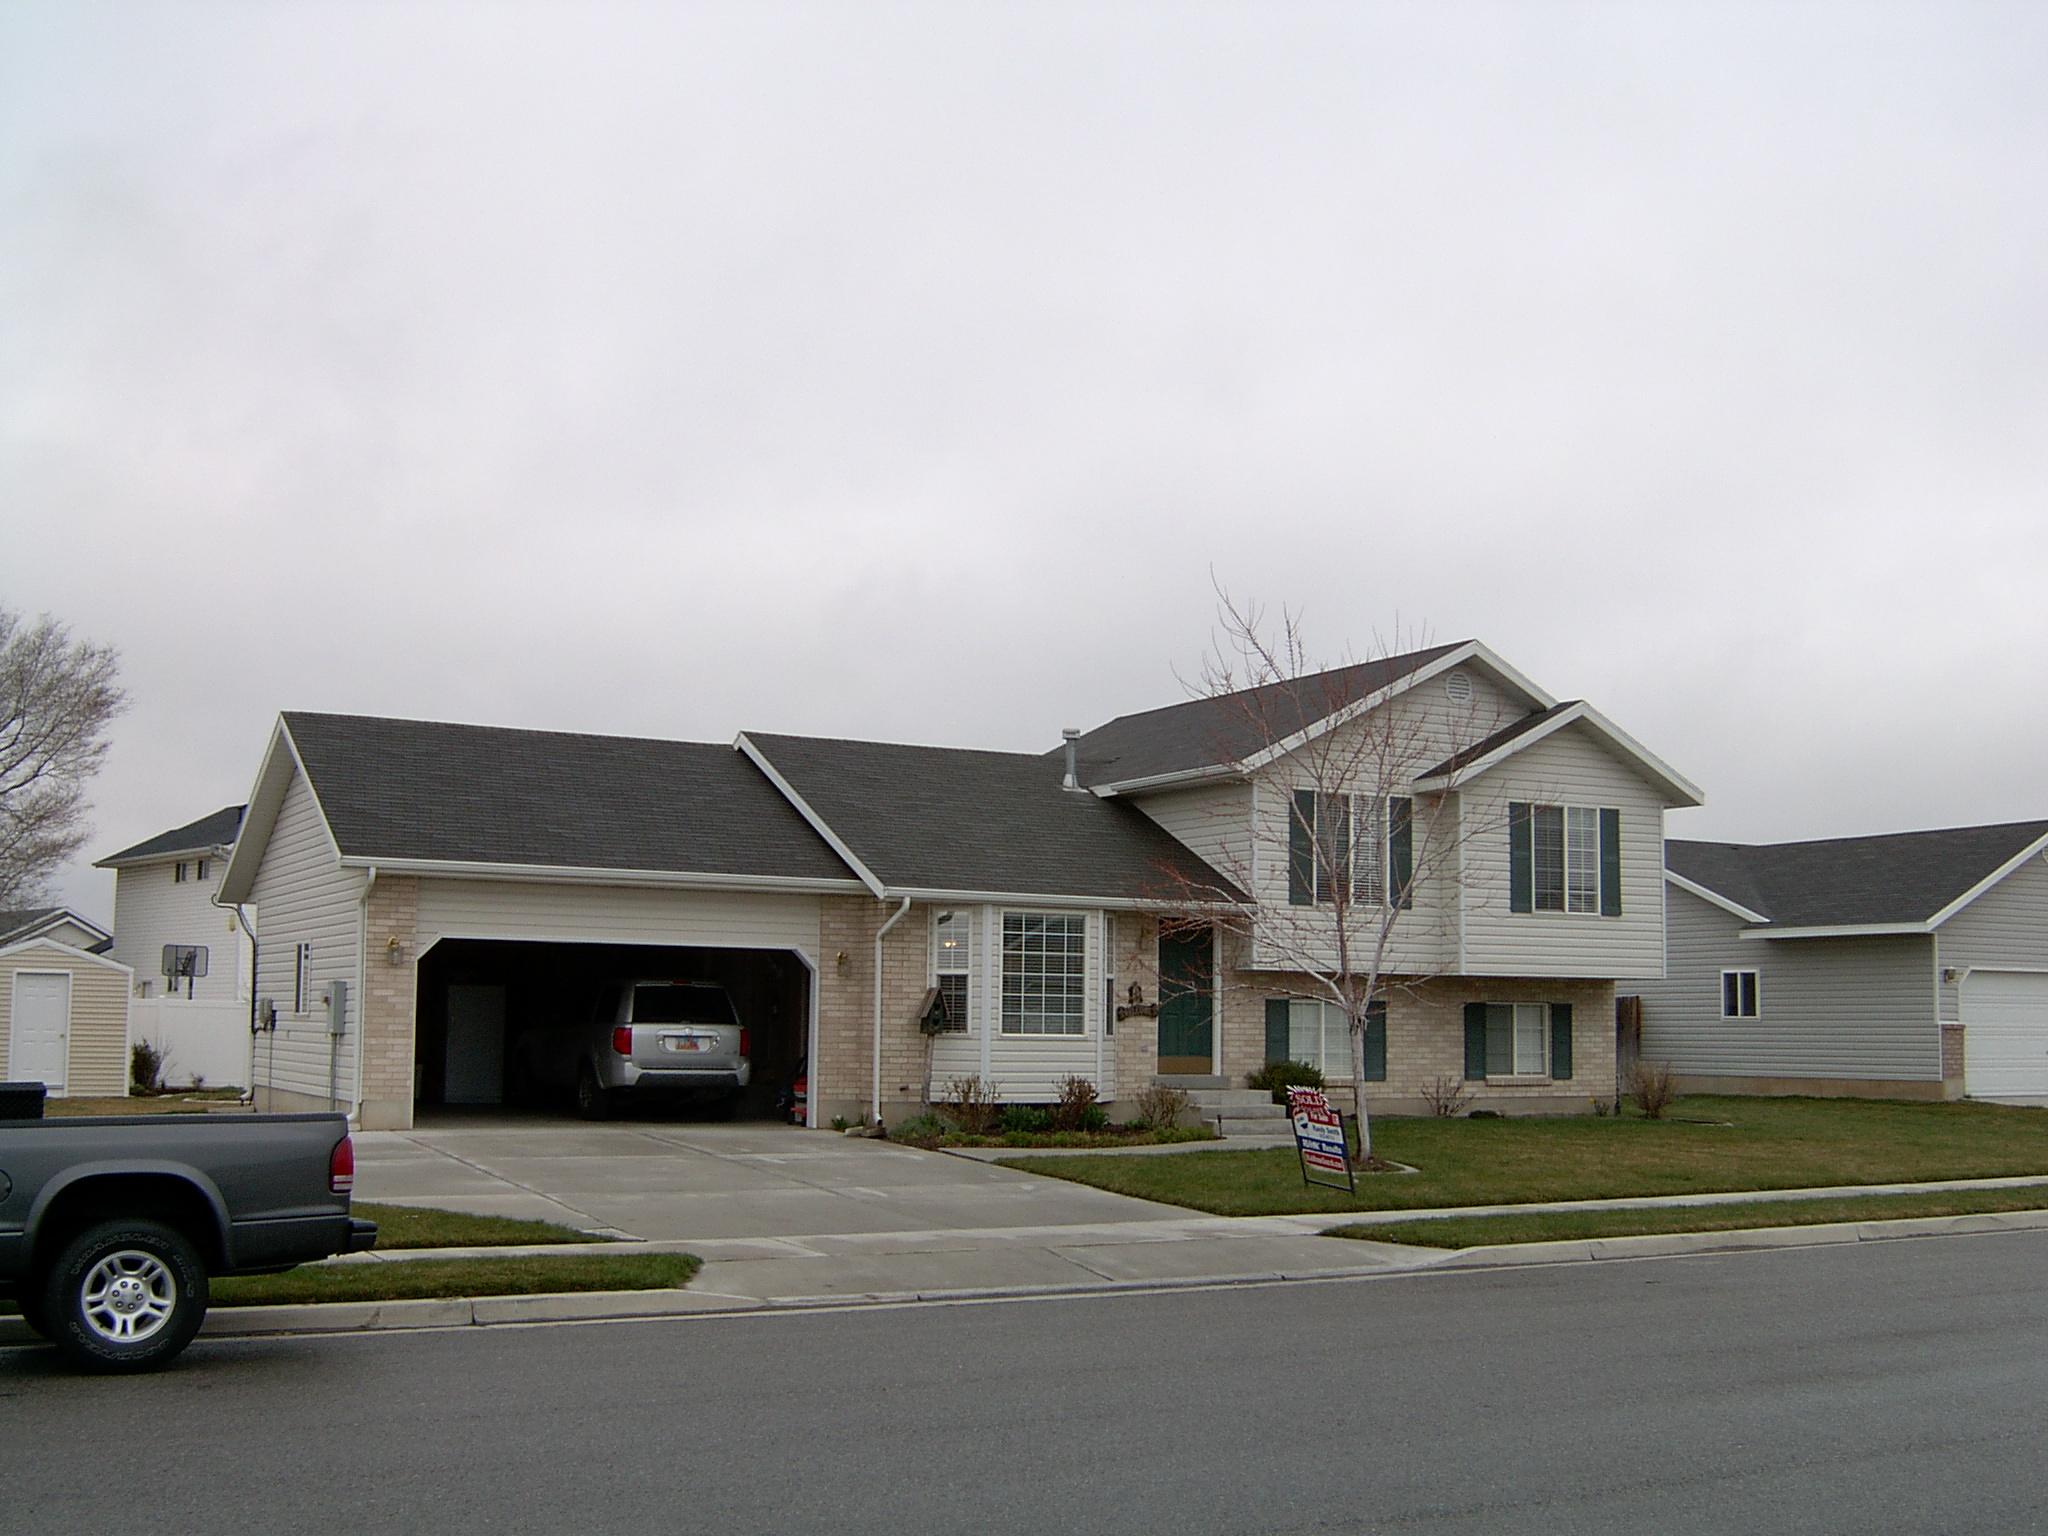 2003-1271P.JPG